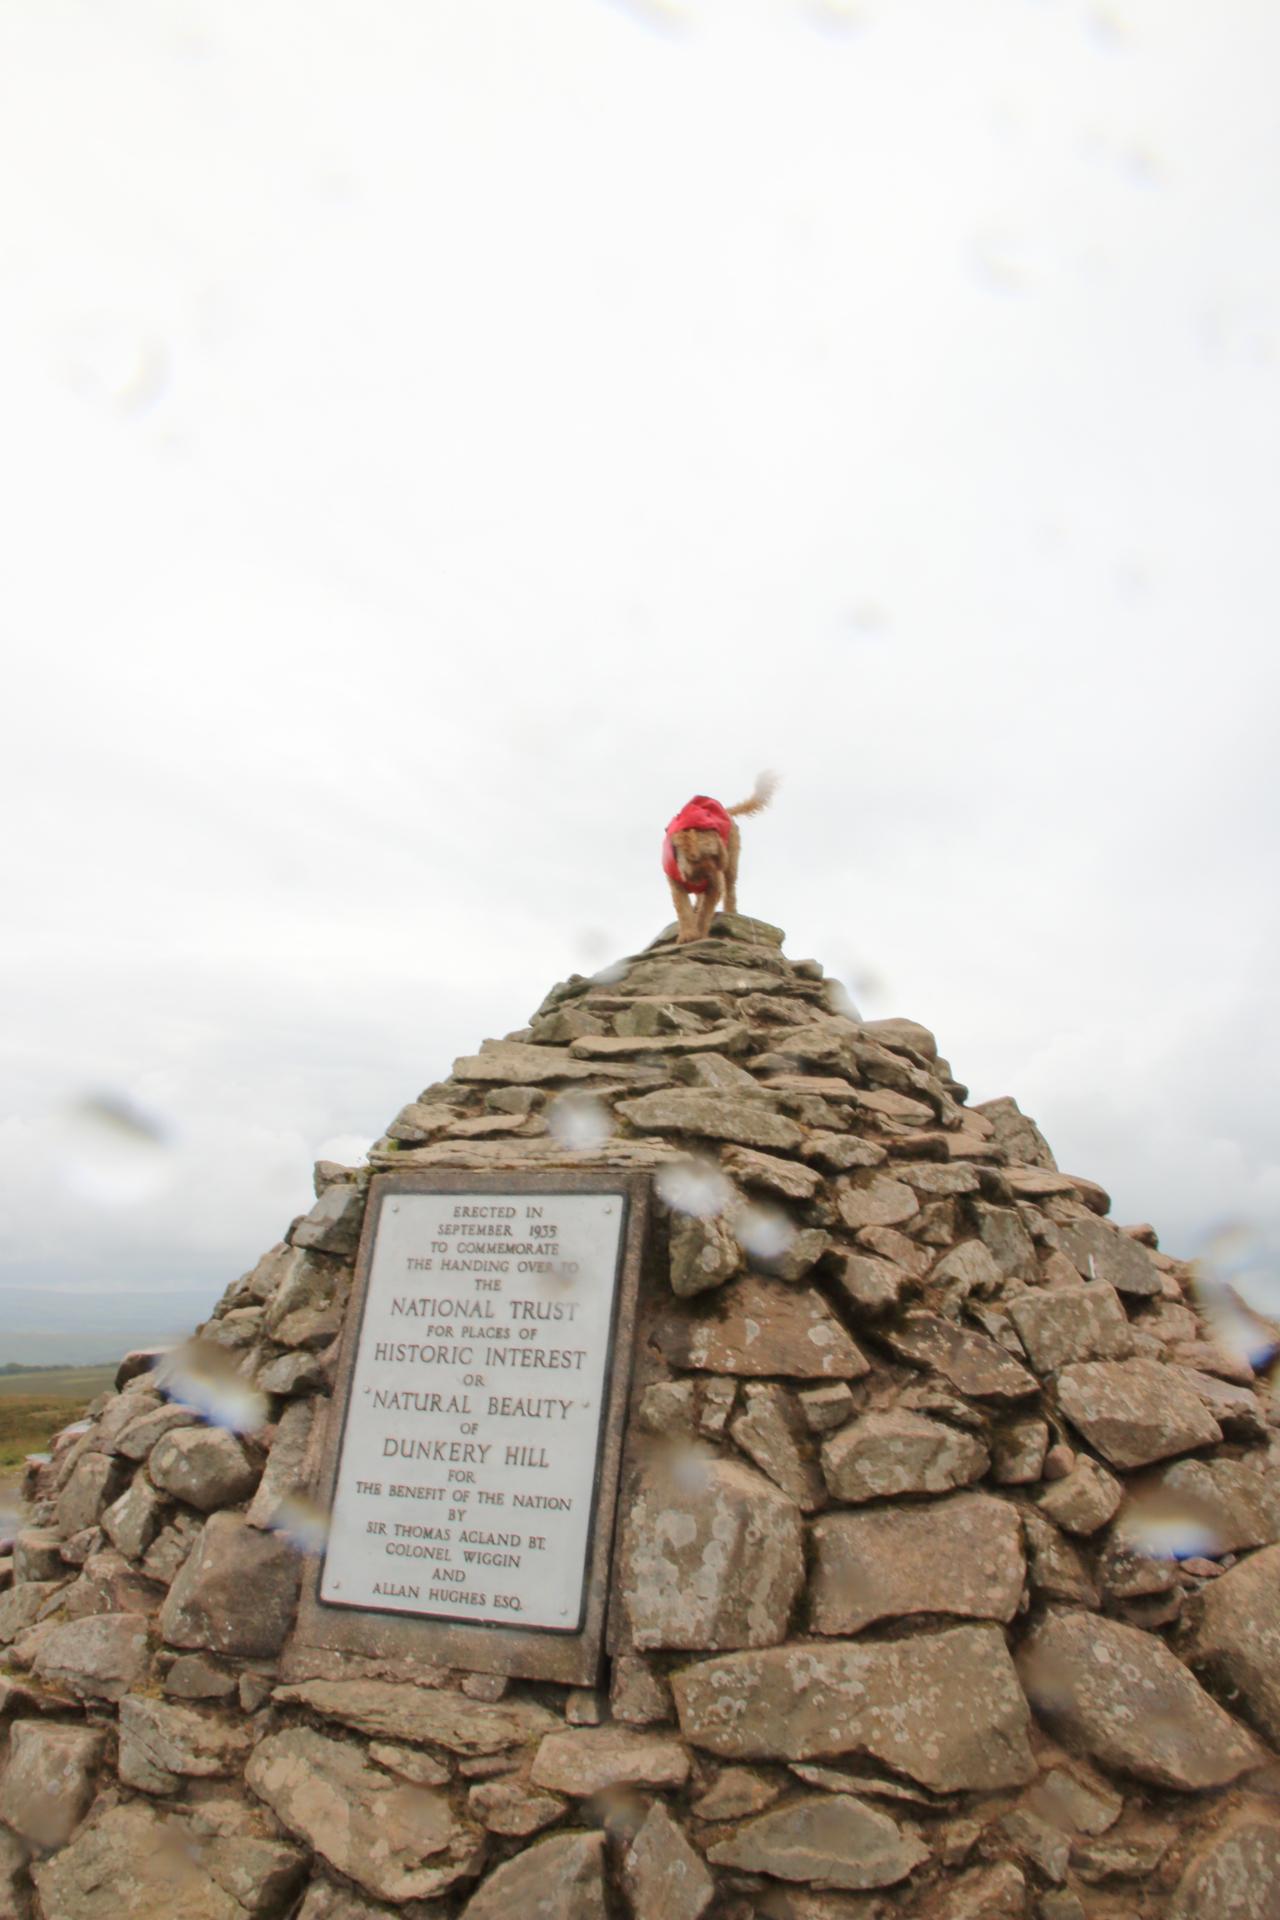 Exmoor Recce and the Quantock Hills - 3 Marilyns